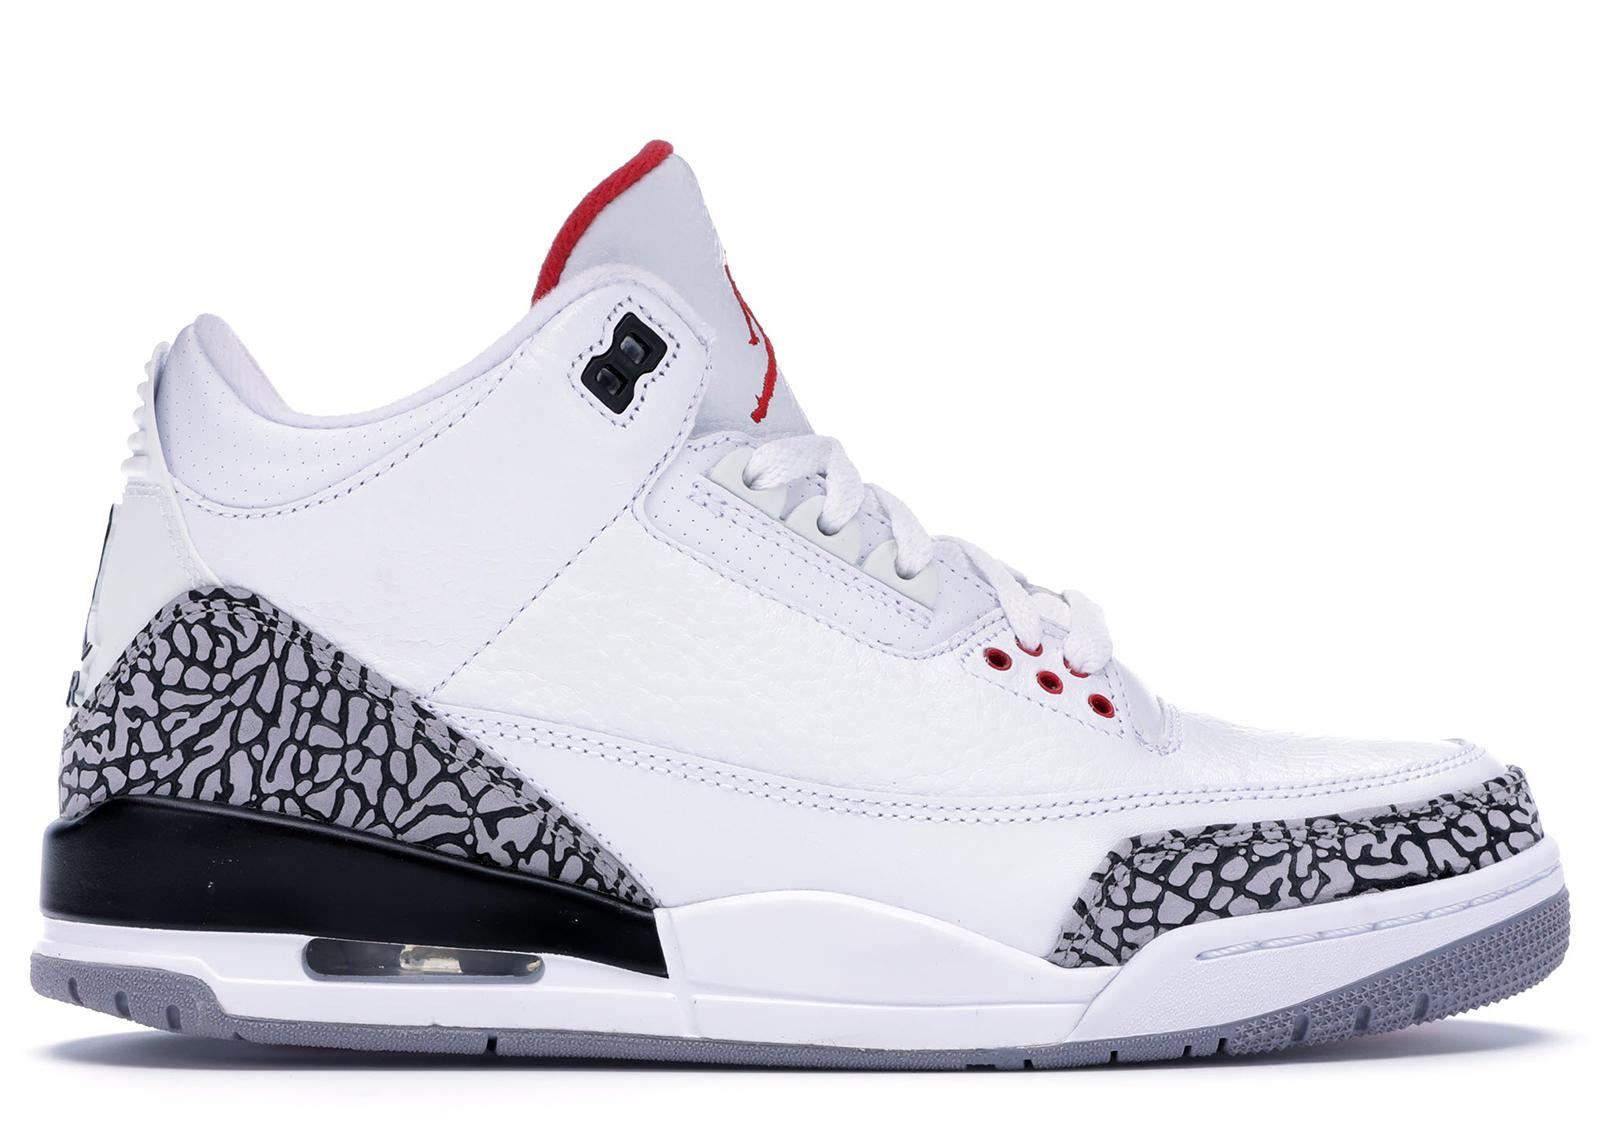 Jordan 3 Retro White Cement (2011)